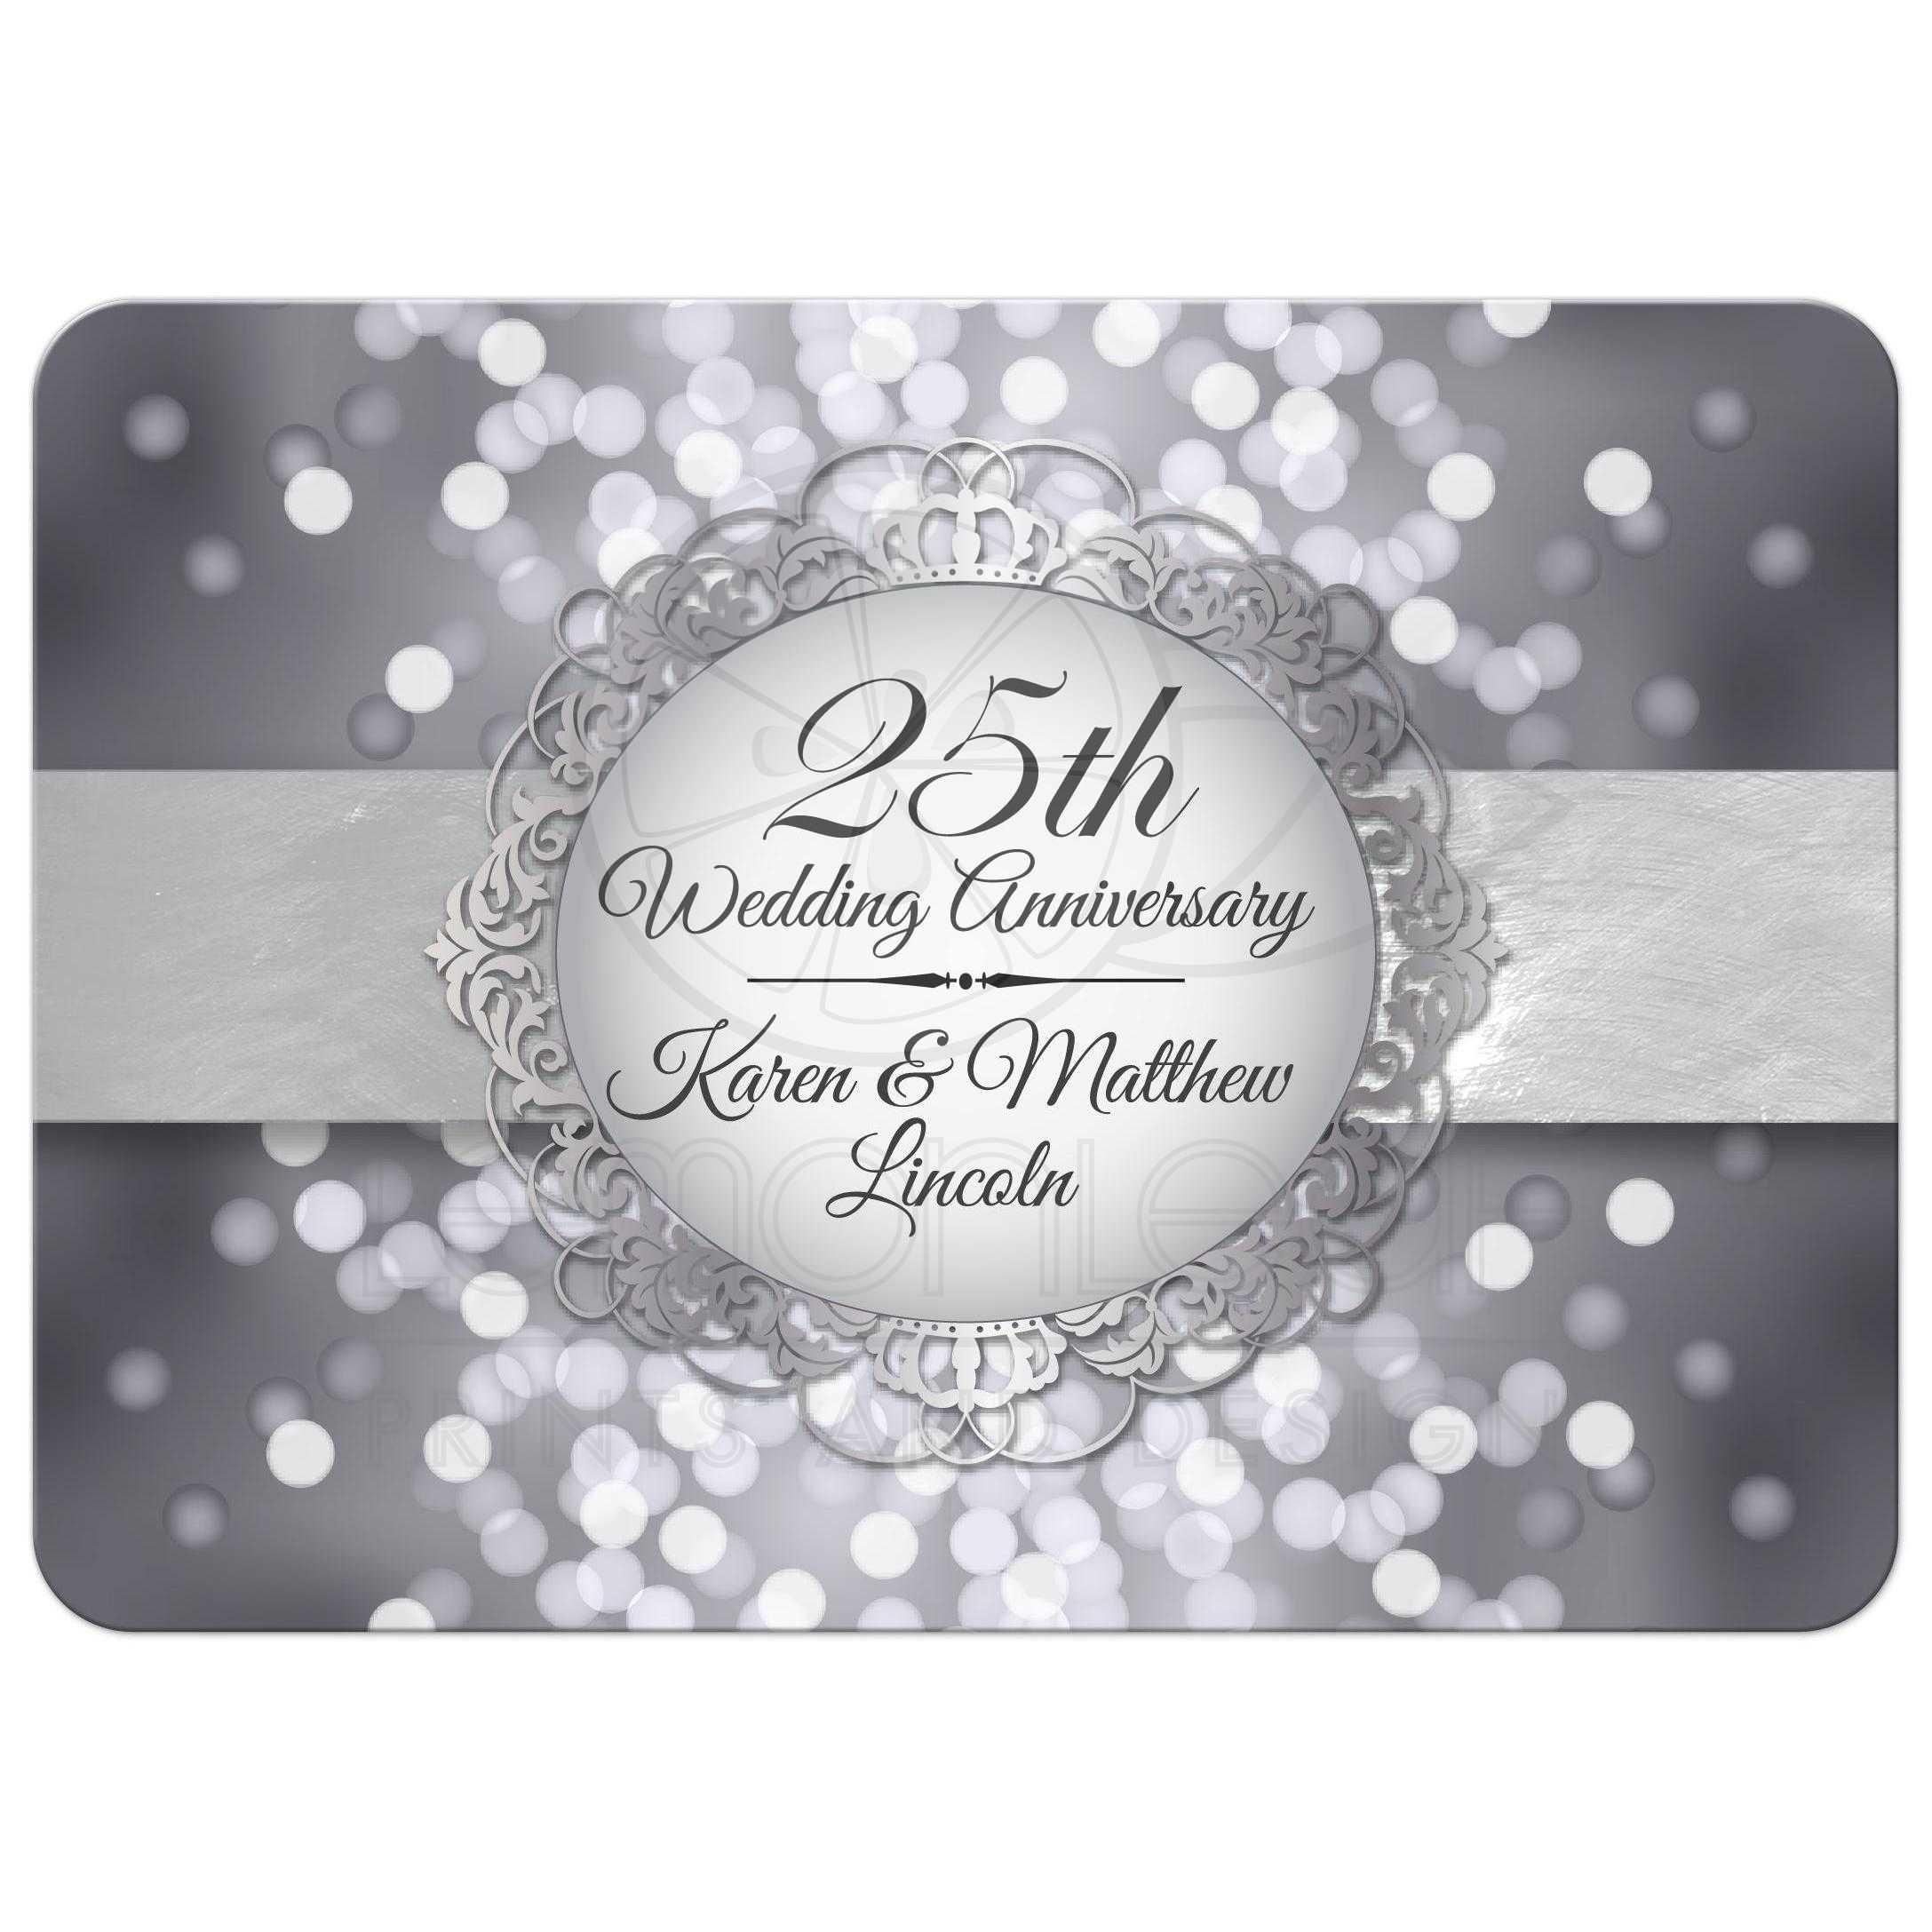 Anniversary Party Invitation - Silver Anniversary Bokeh Medallion